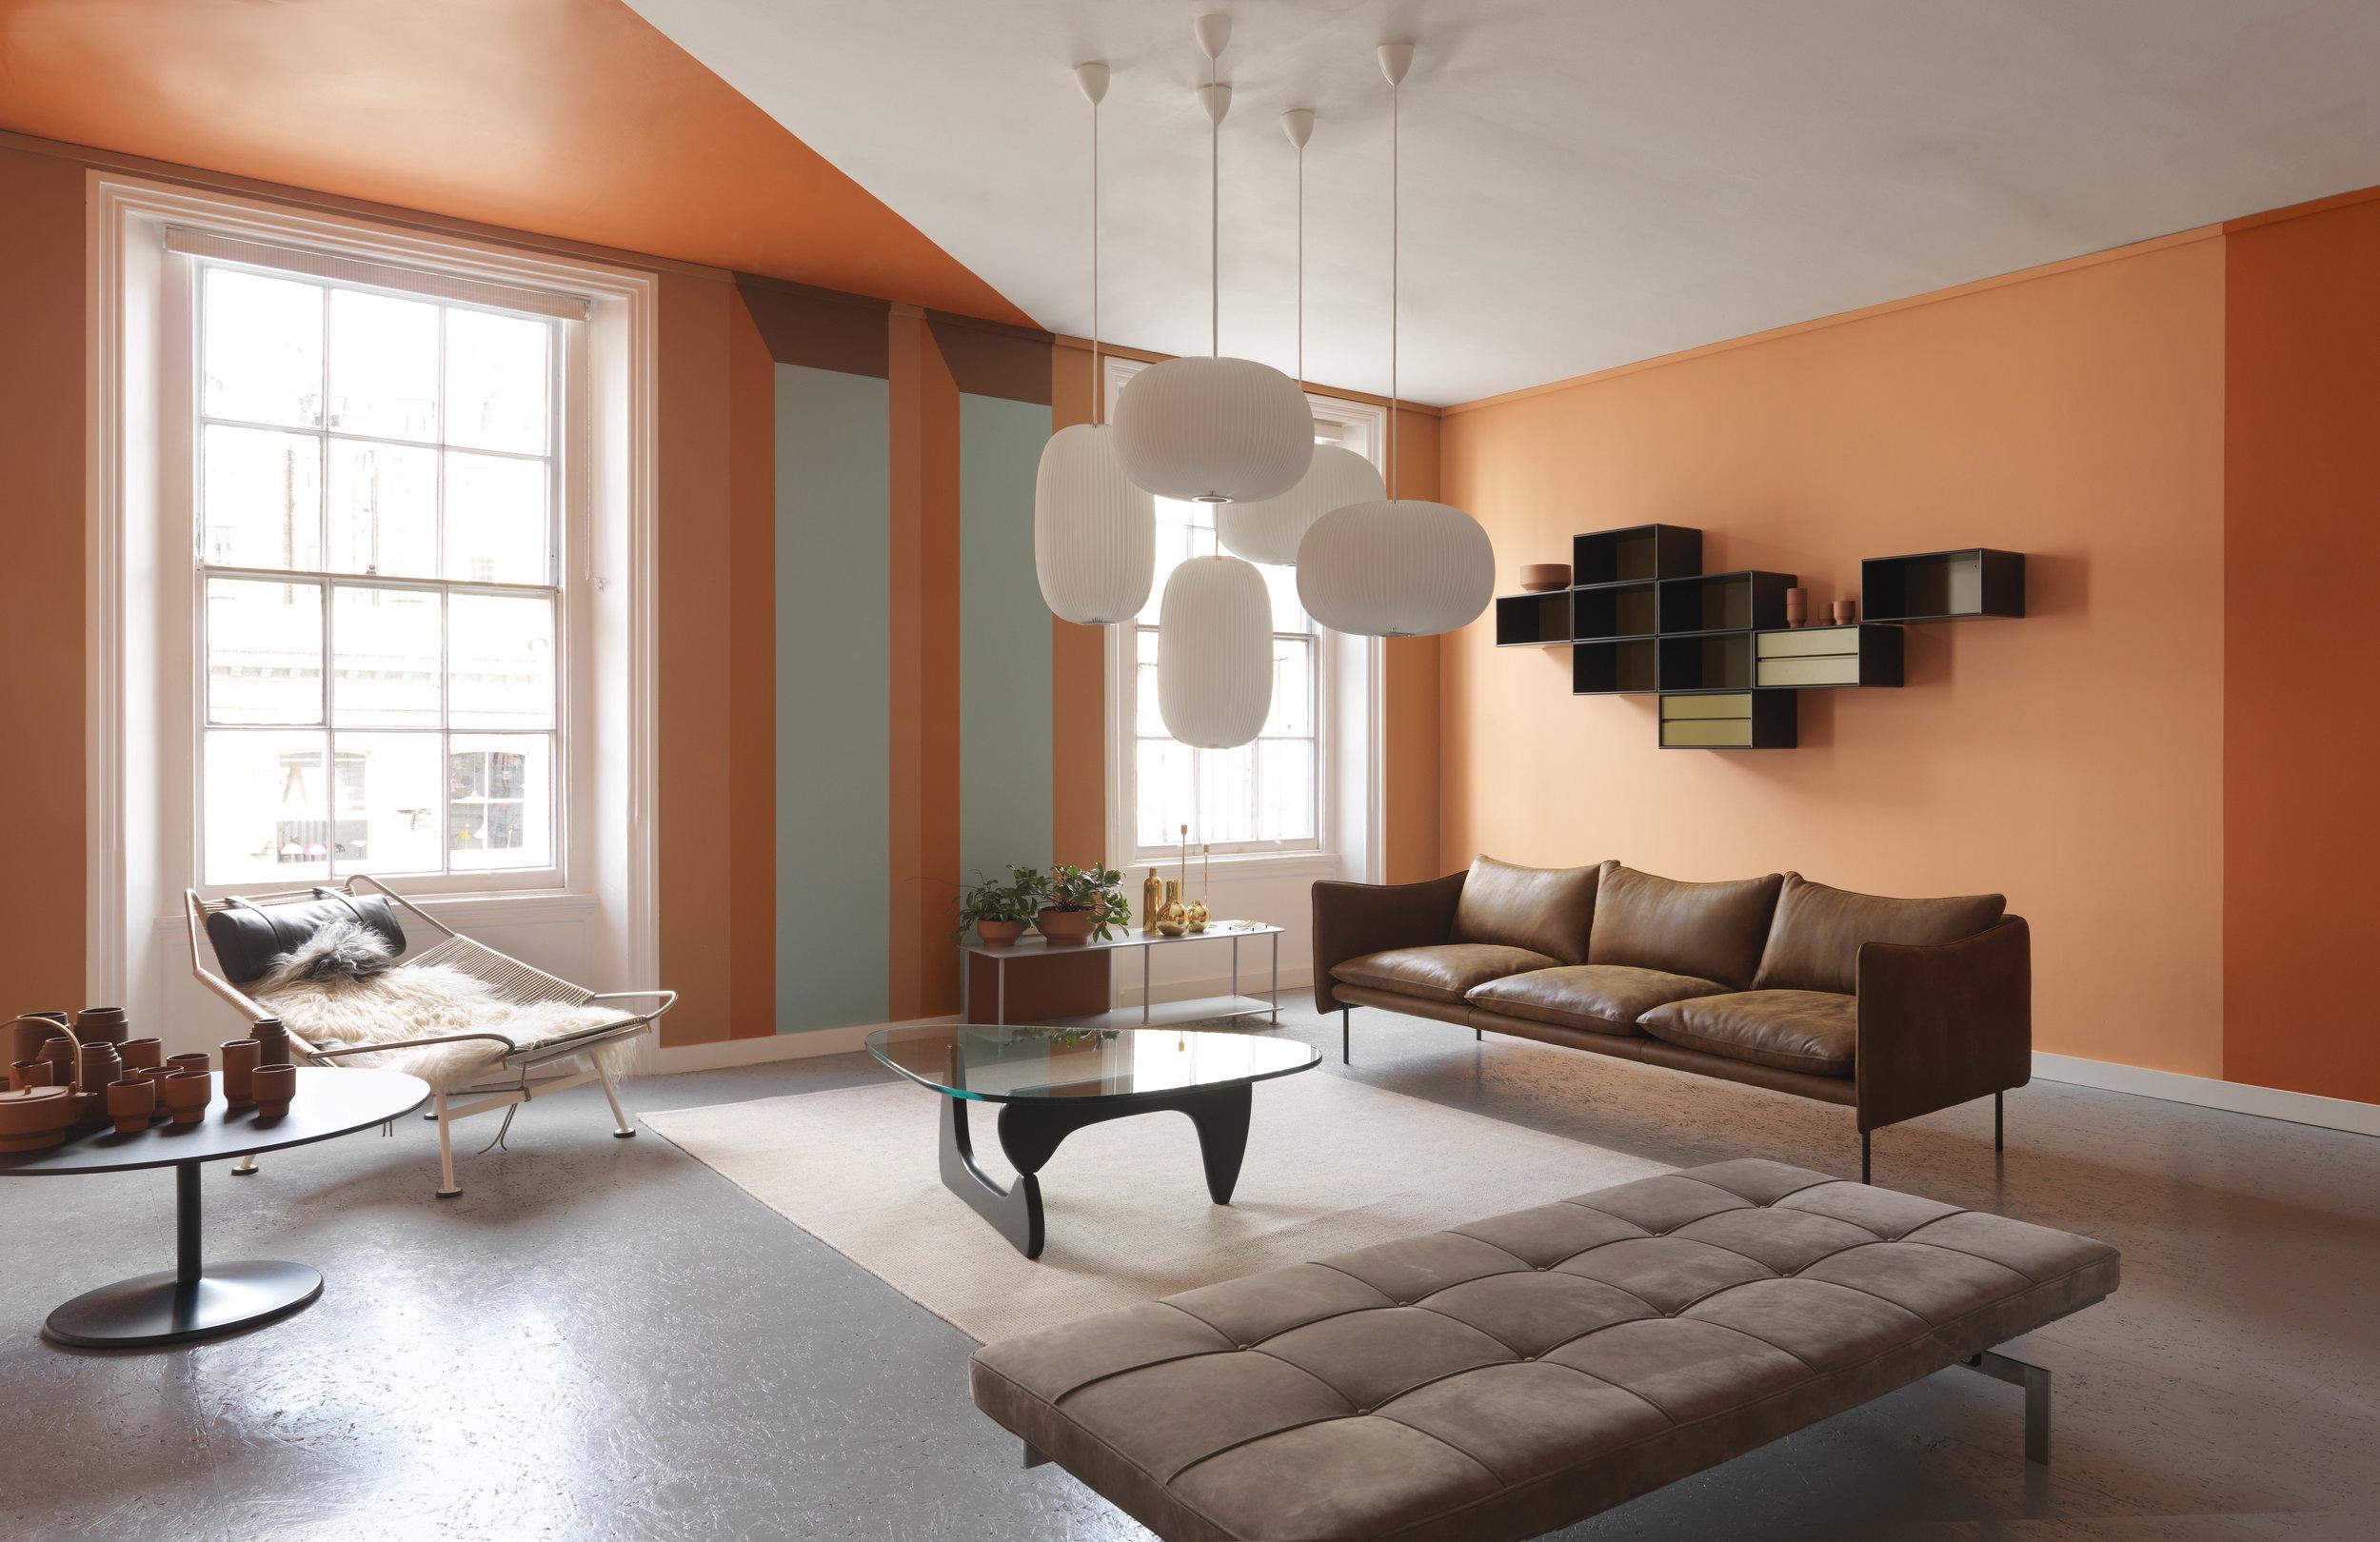 Montana designers Storage and shelving systems London Design Week home interior Scandinavian design Scandinavian home Livingroom.jpg